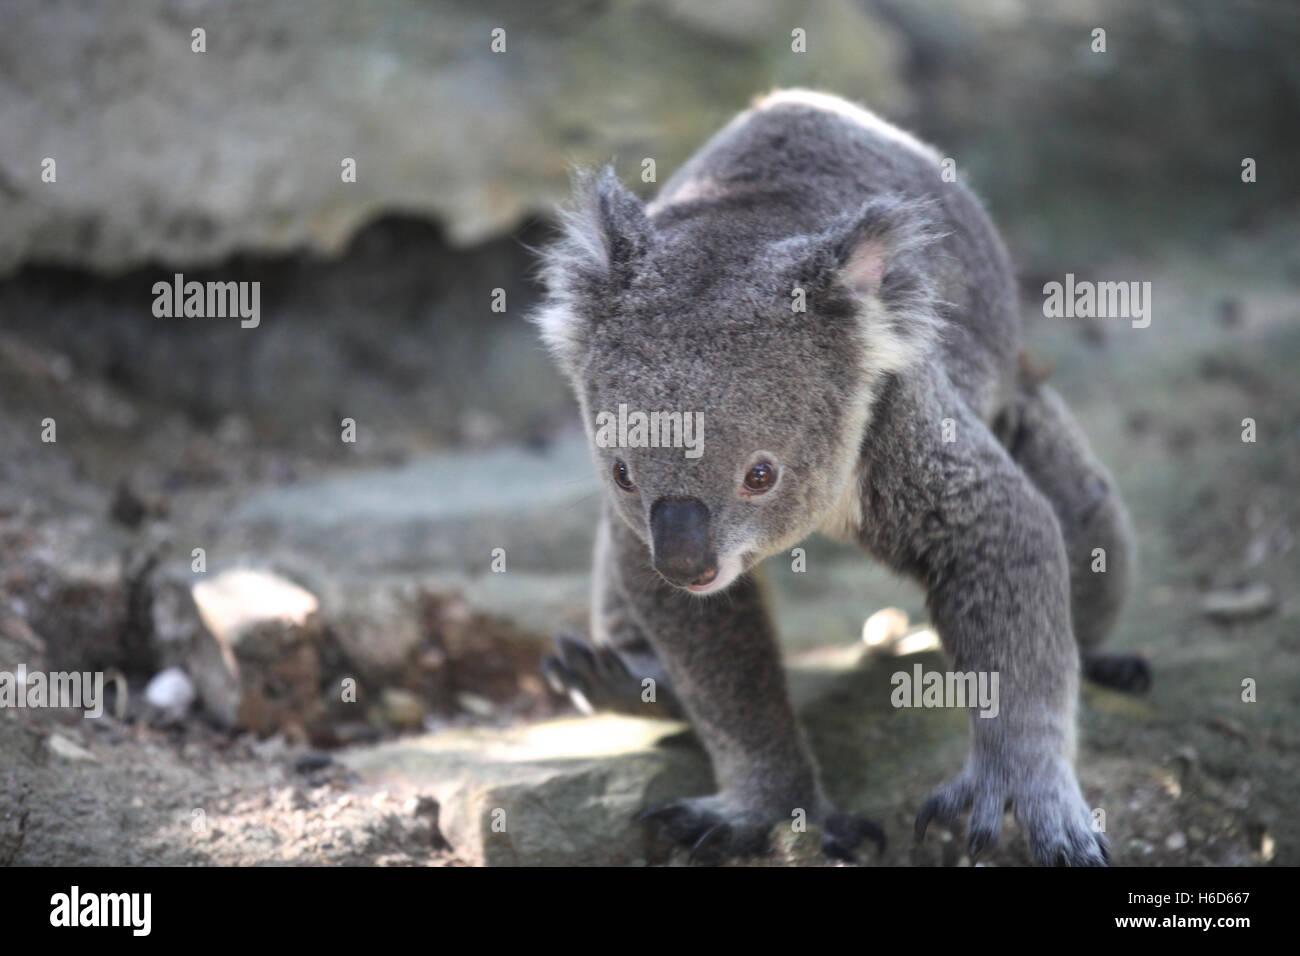 Koala is a small marsupial animal, Thailand, Southeast Asia - Stock Image